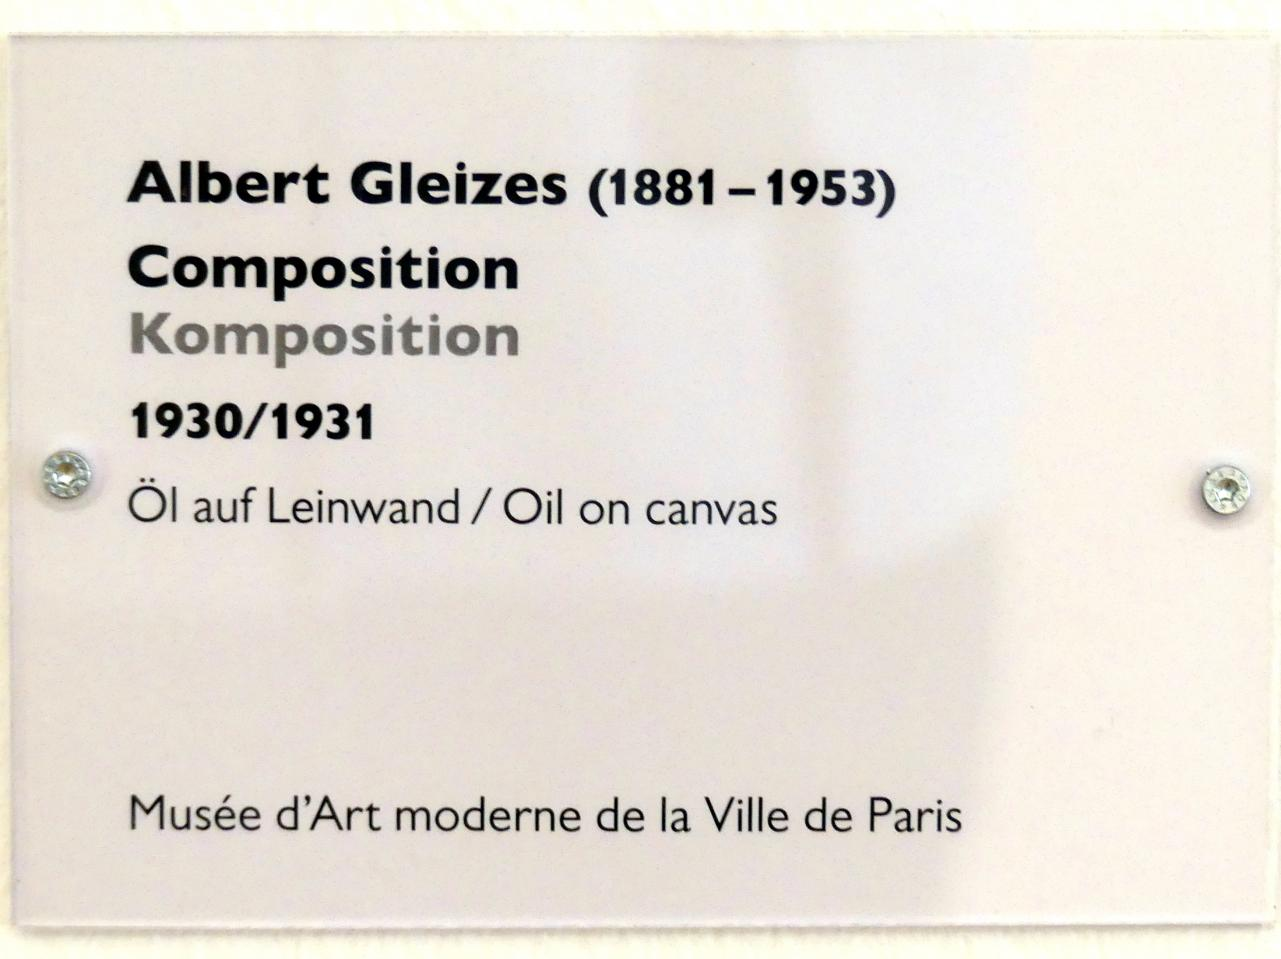 Albert Gleizes: Komposition, 1930 - 1931, Bild 2/2